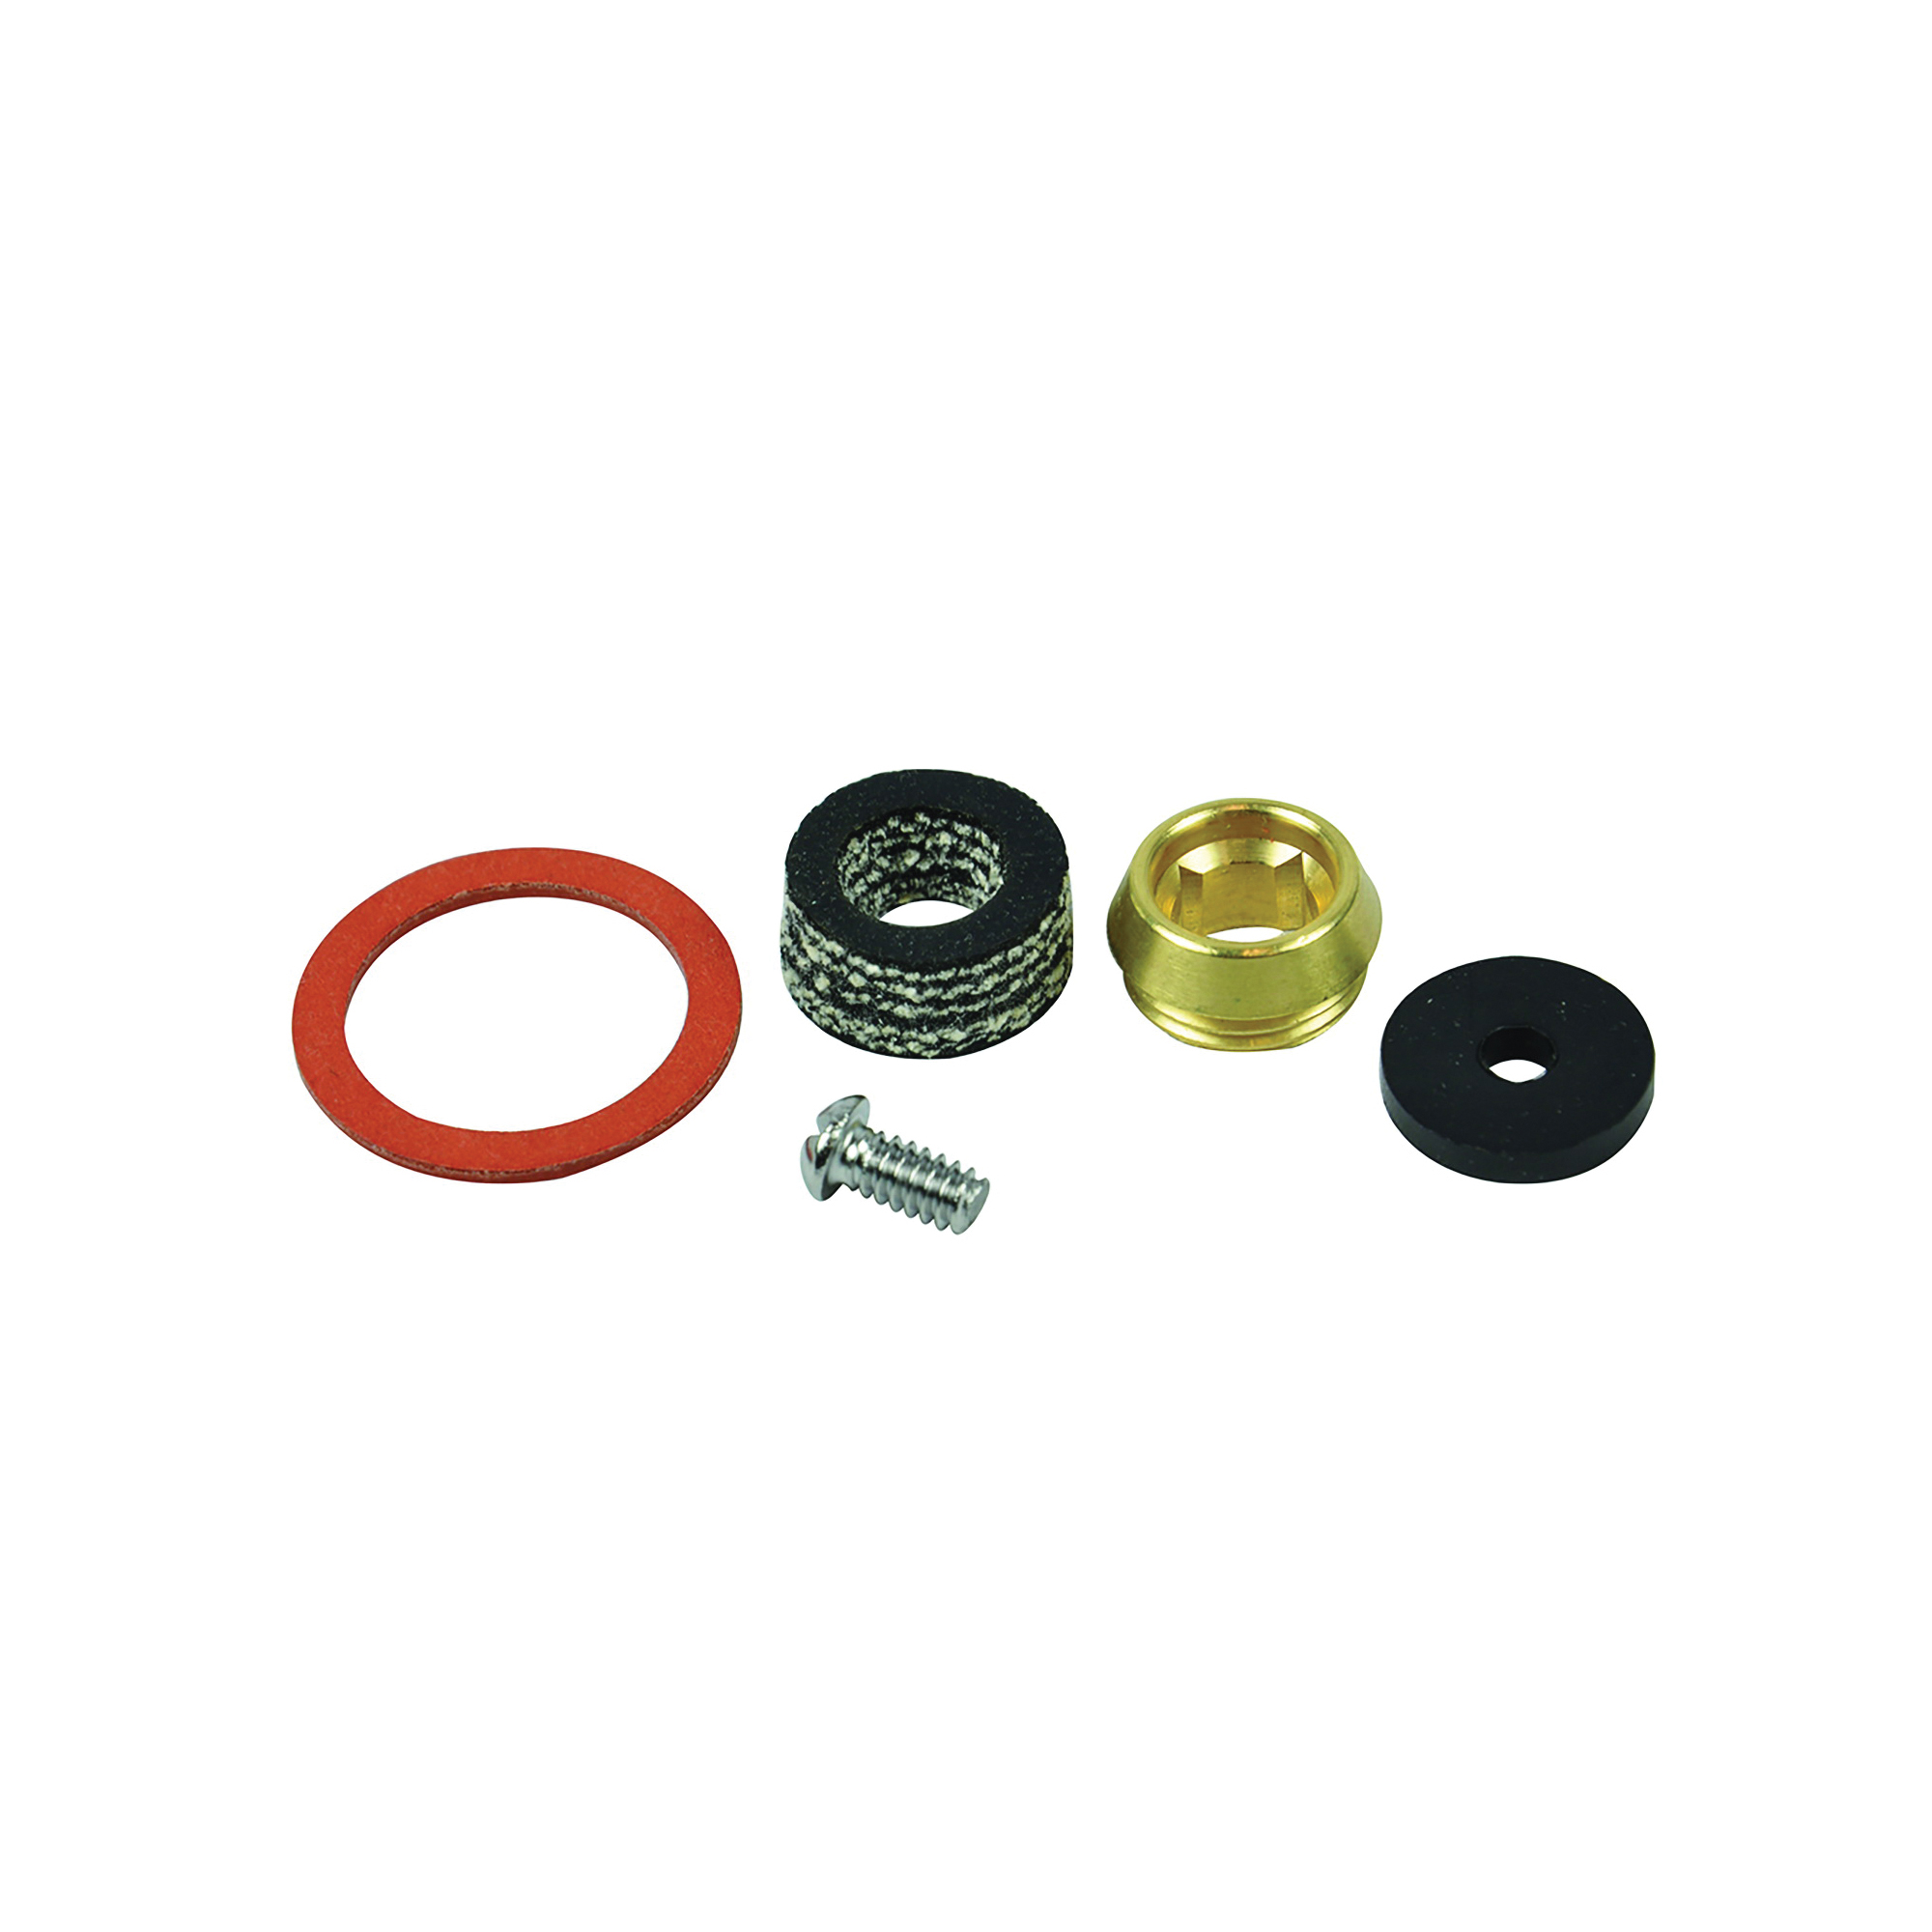 Picture of Danco 124162 Stem Repair Kit, Brass/Rubber